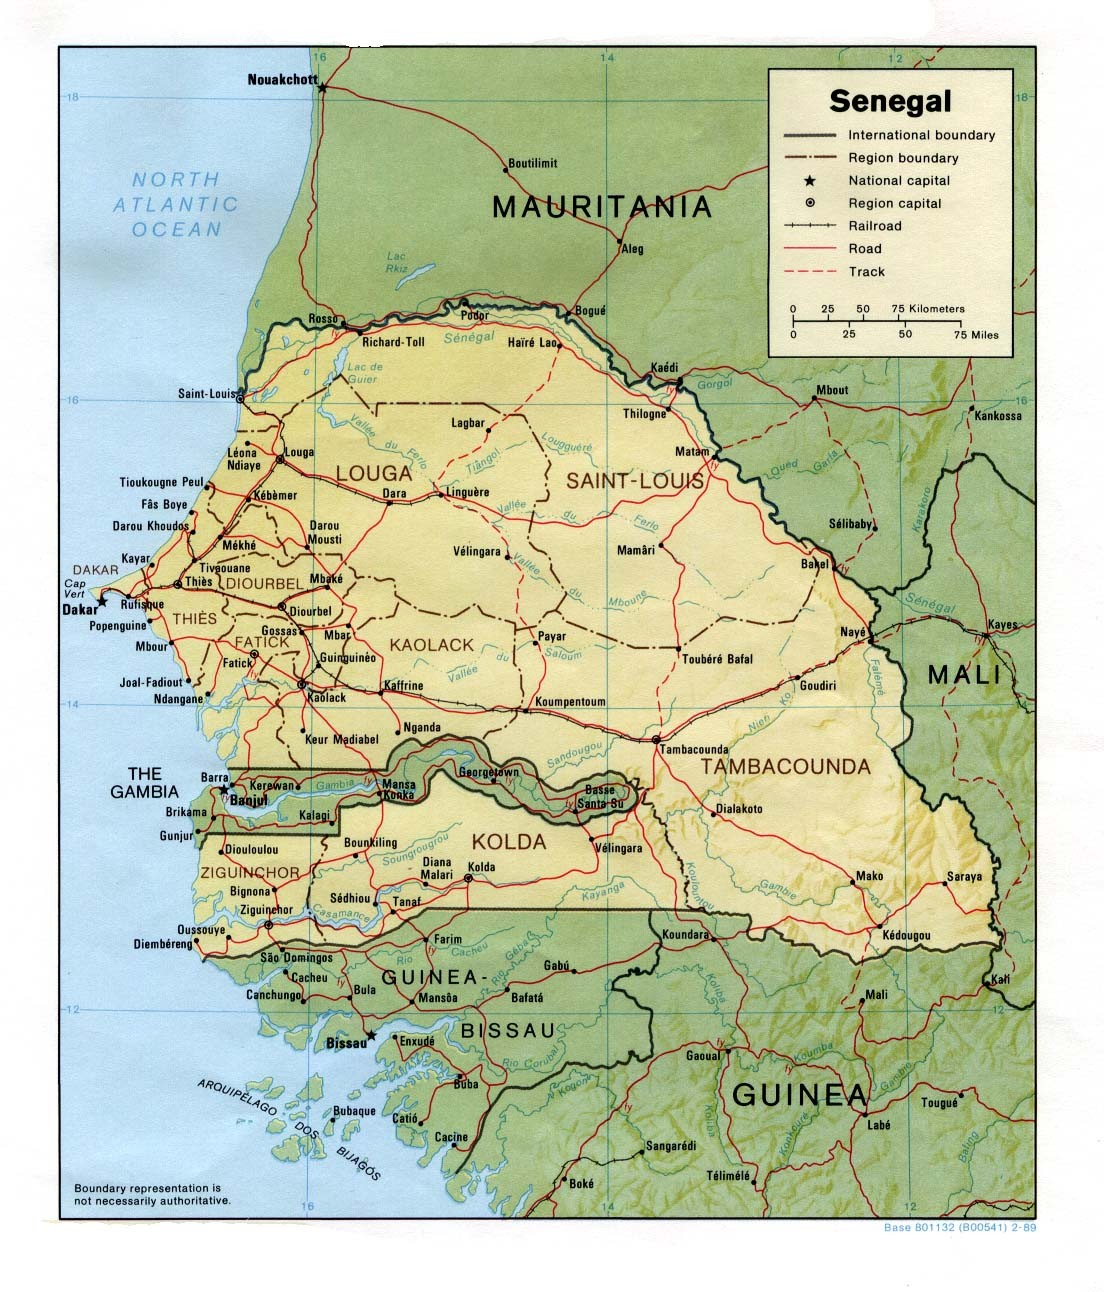 Senegal - General Information